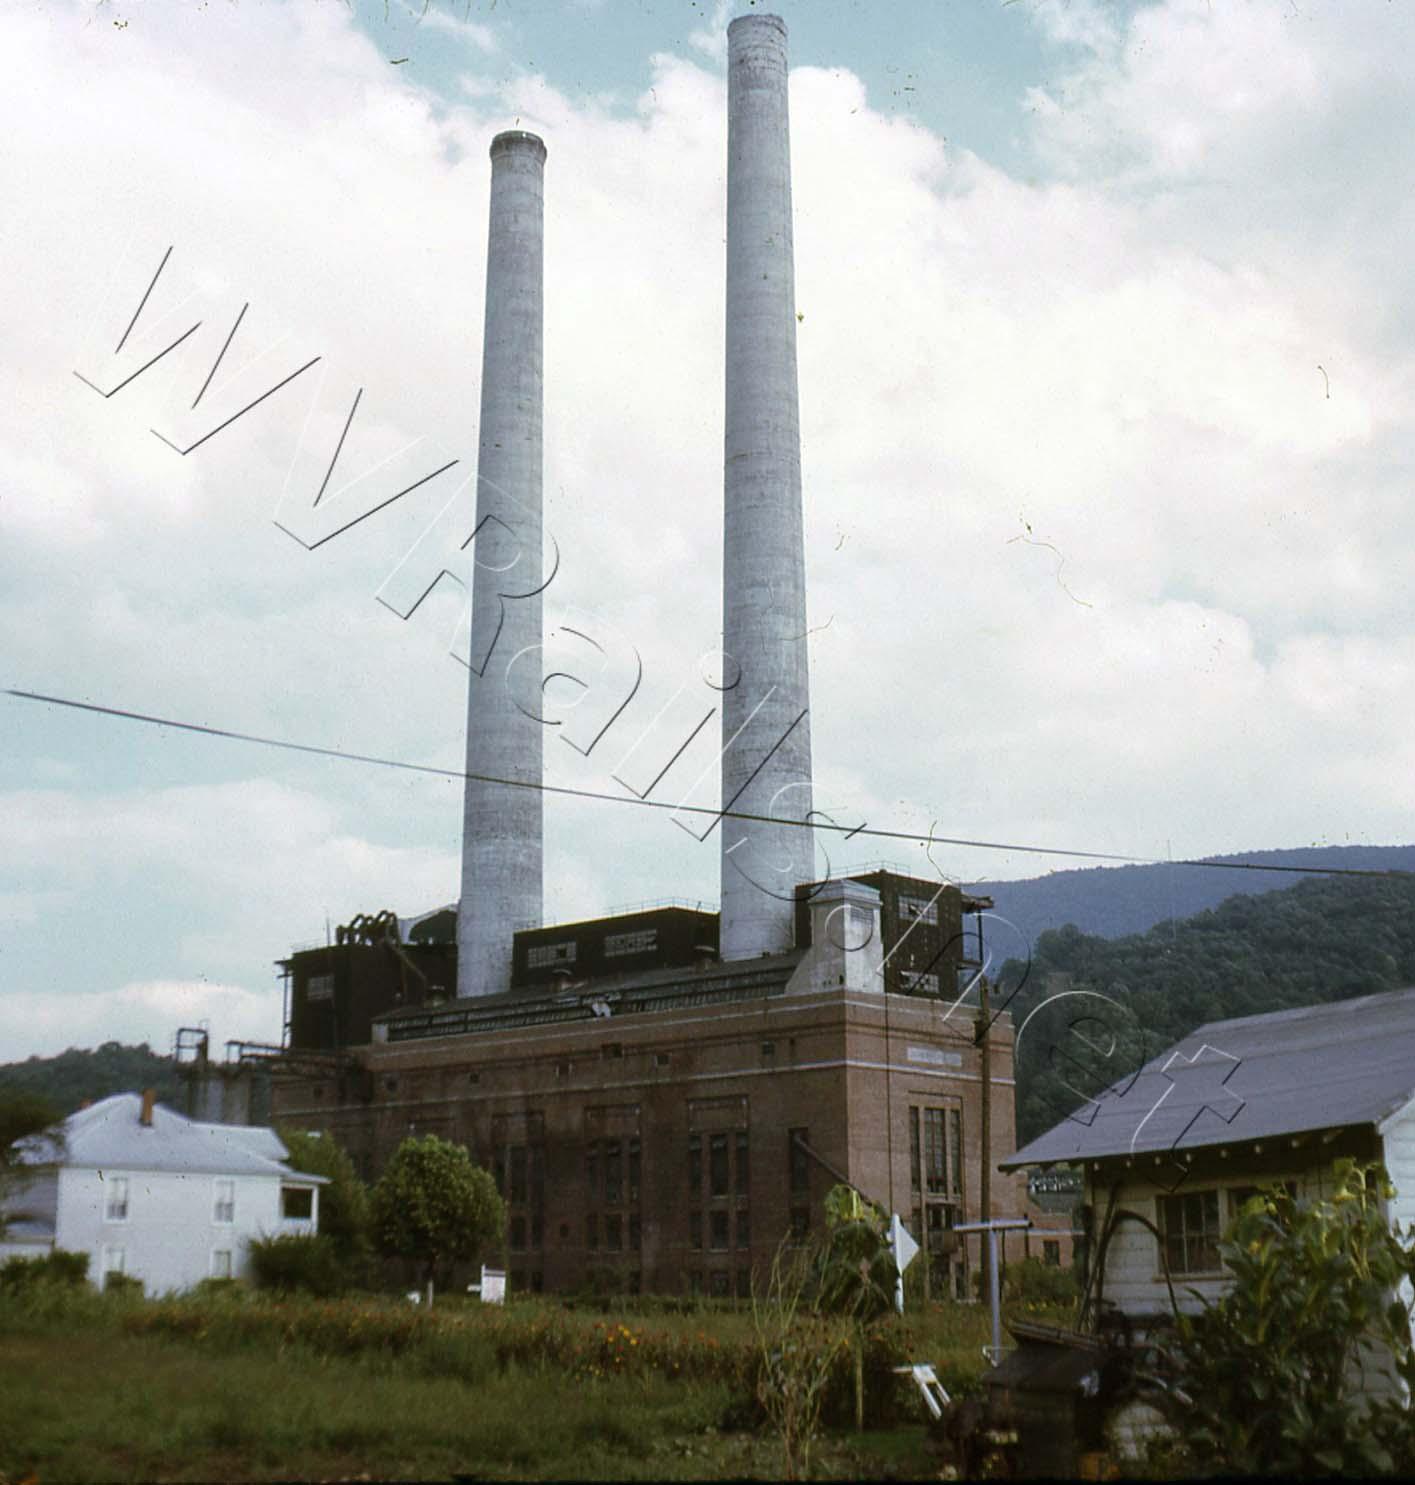 Ex VGN Power Plant Narrows, VA OCT 1969